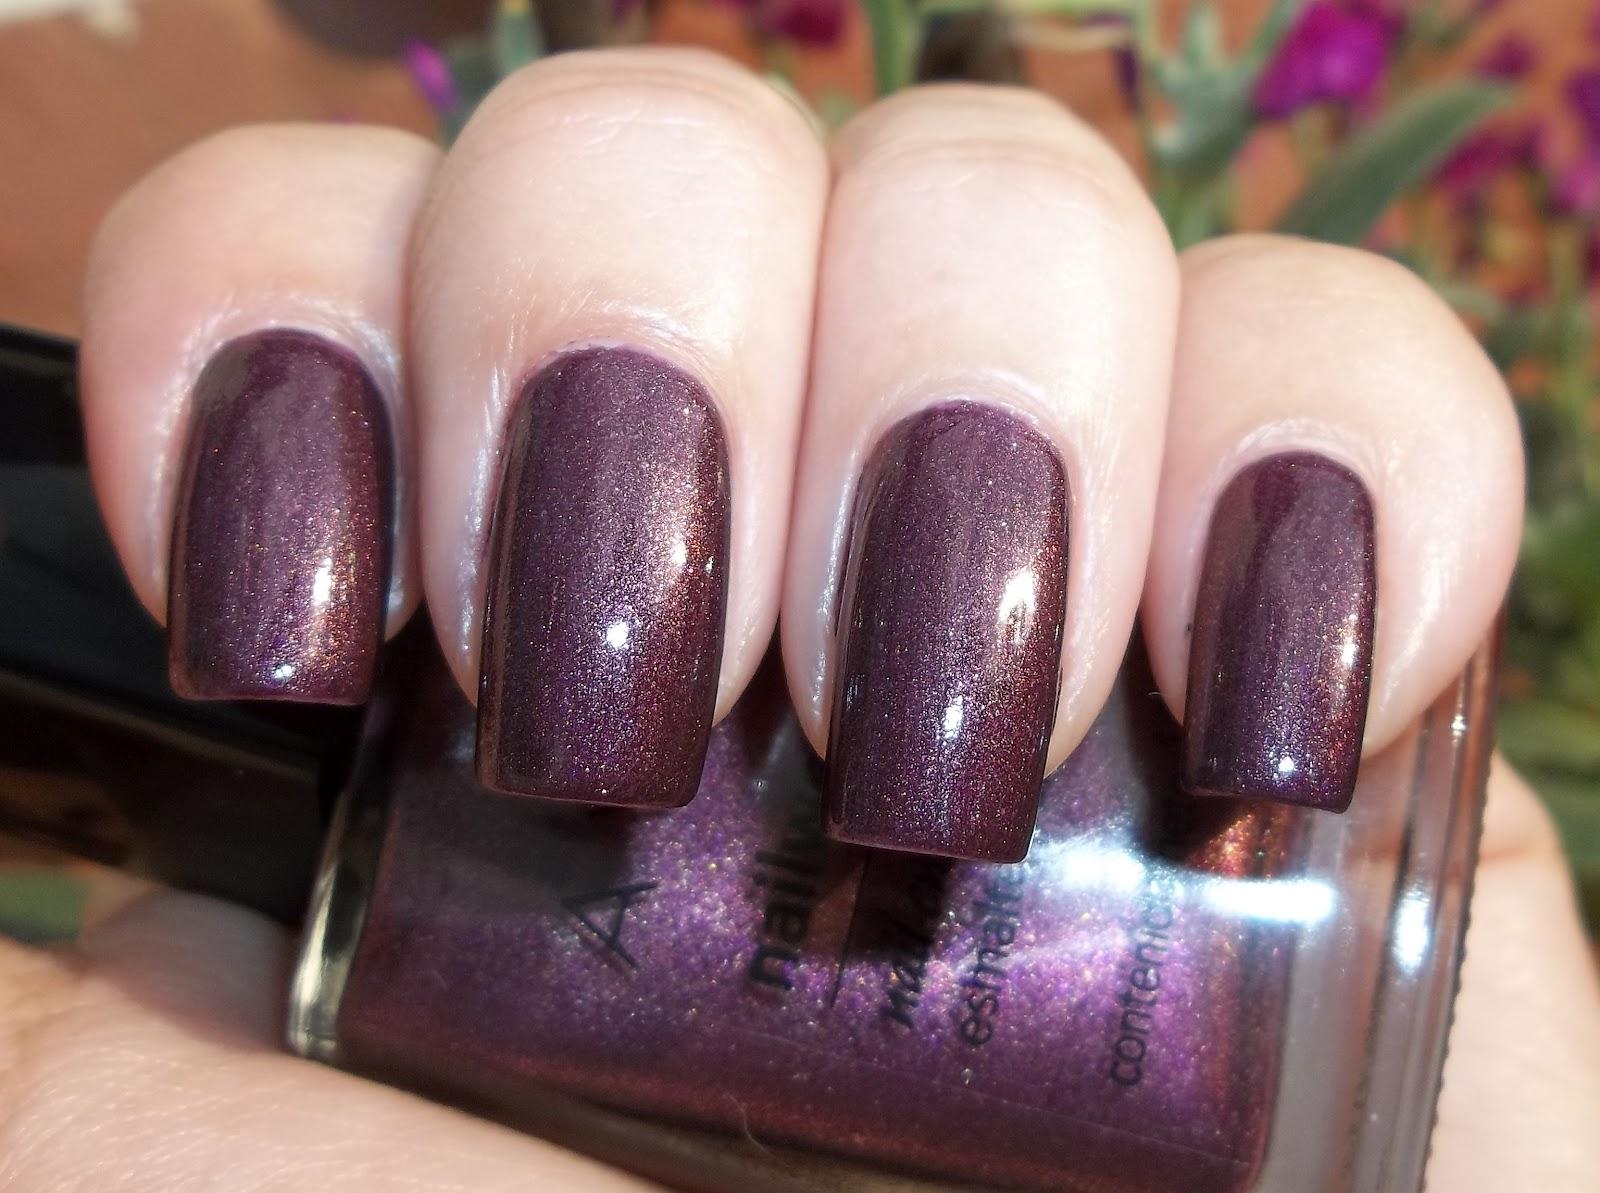 miss phibes.: Avon Nail Wear Pro Night Violet